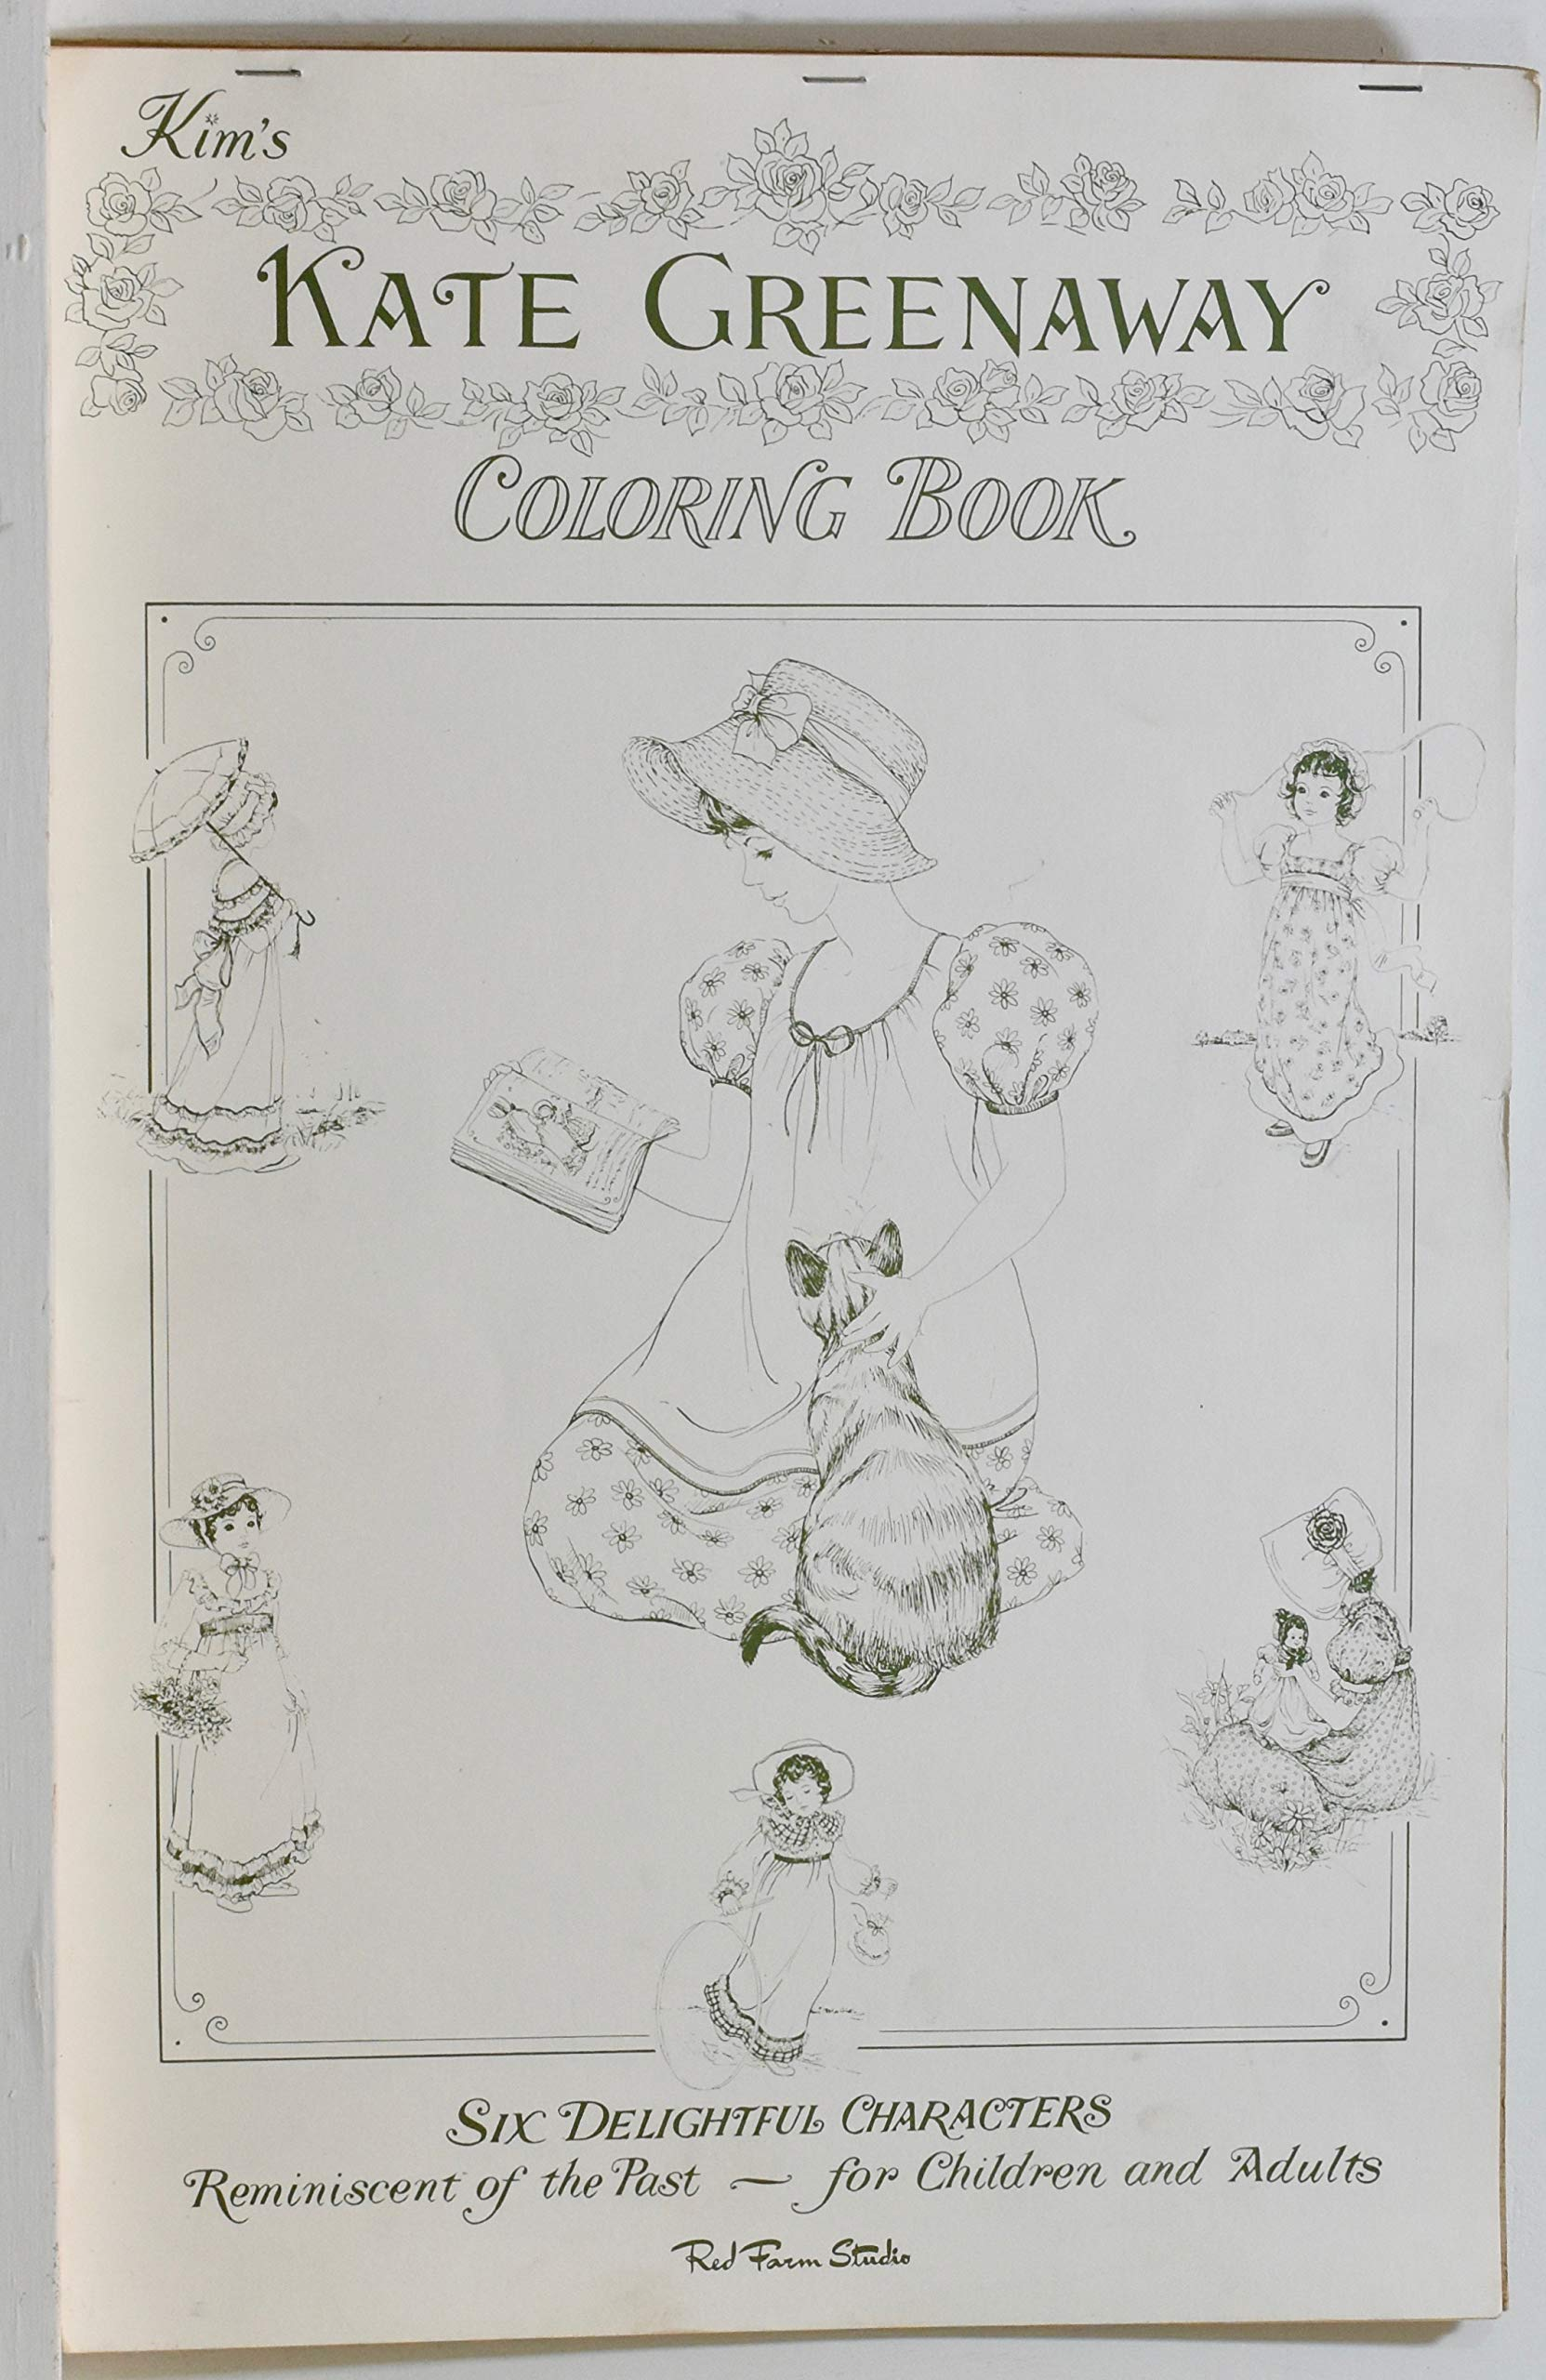 Kim\'s Kate Greenaway Coloring Book: Kate) Greenaway: Amazon.com: Books